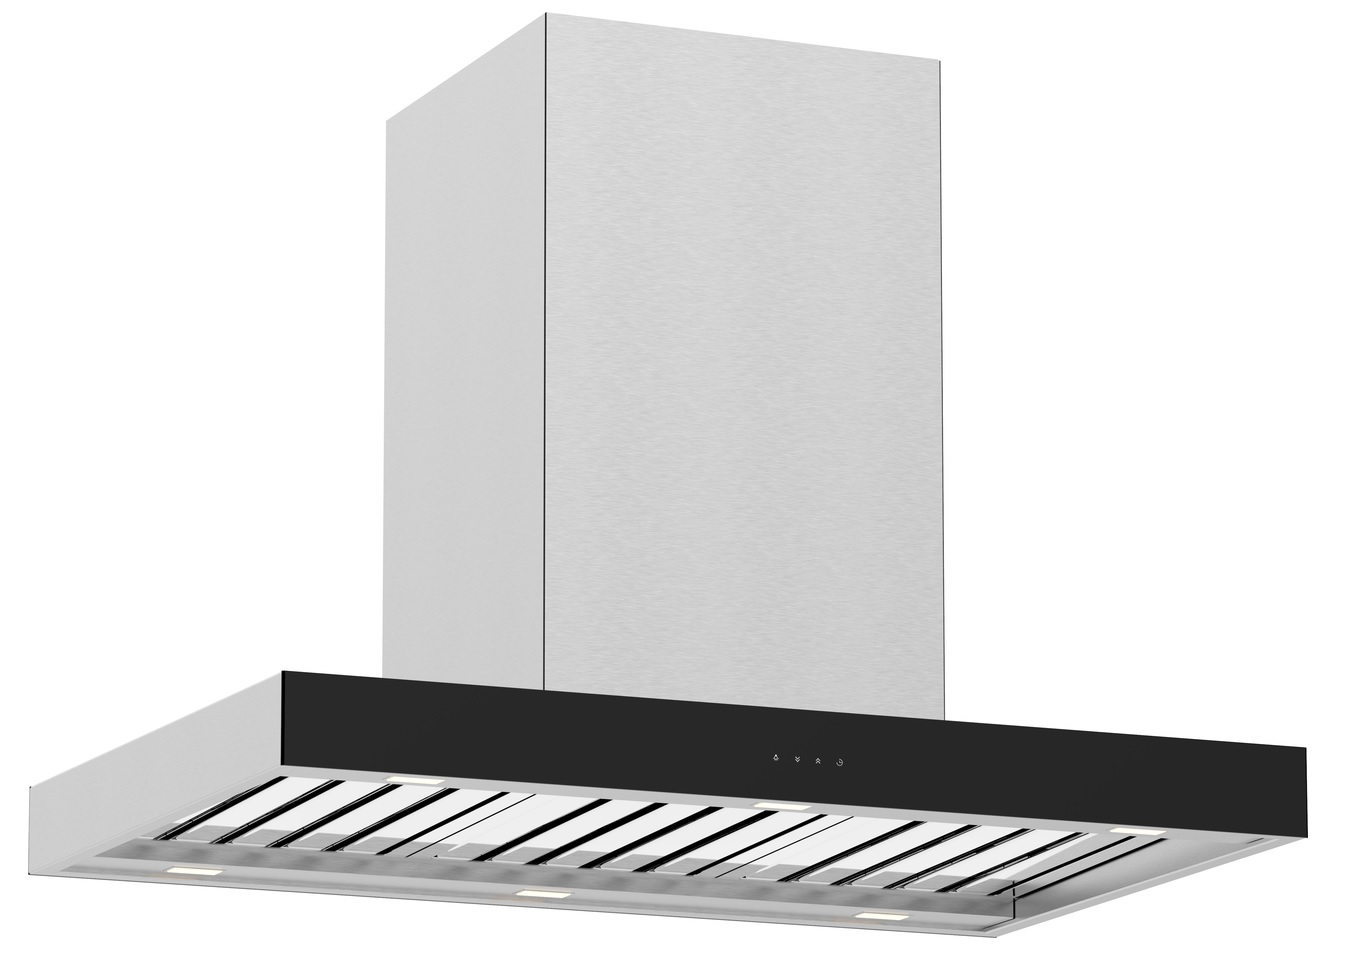 Whispair X7R09S6 OU-T Kitchen Hood